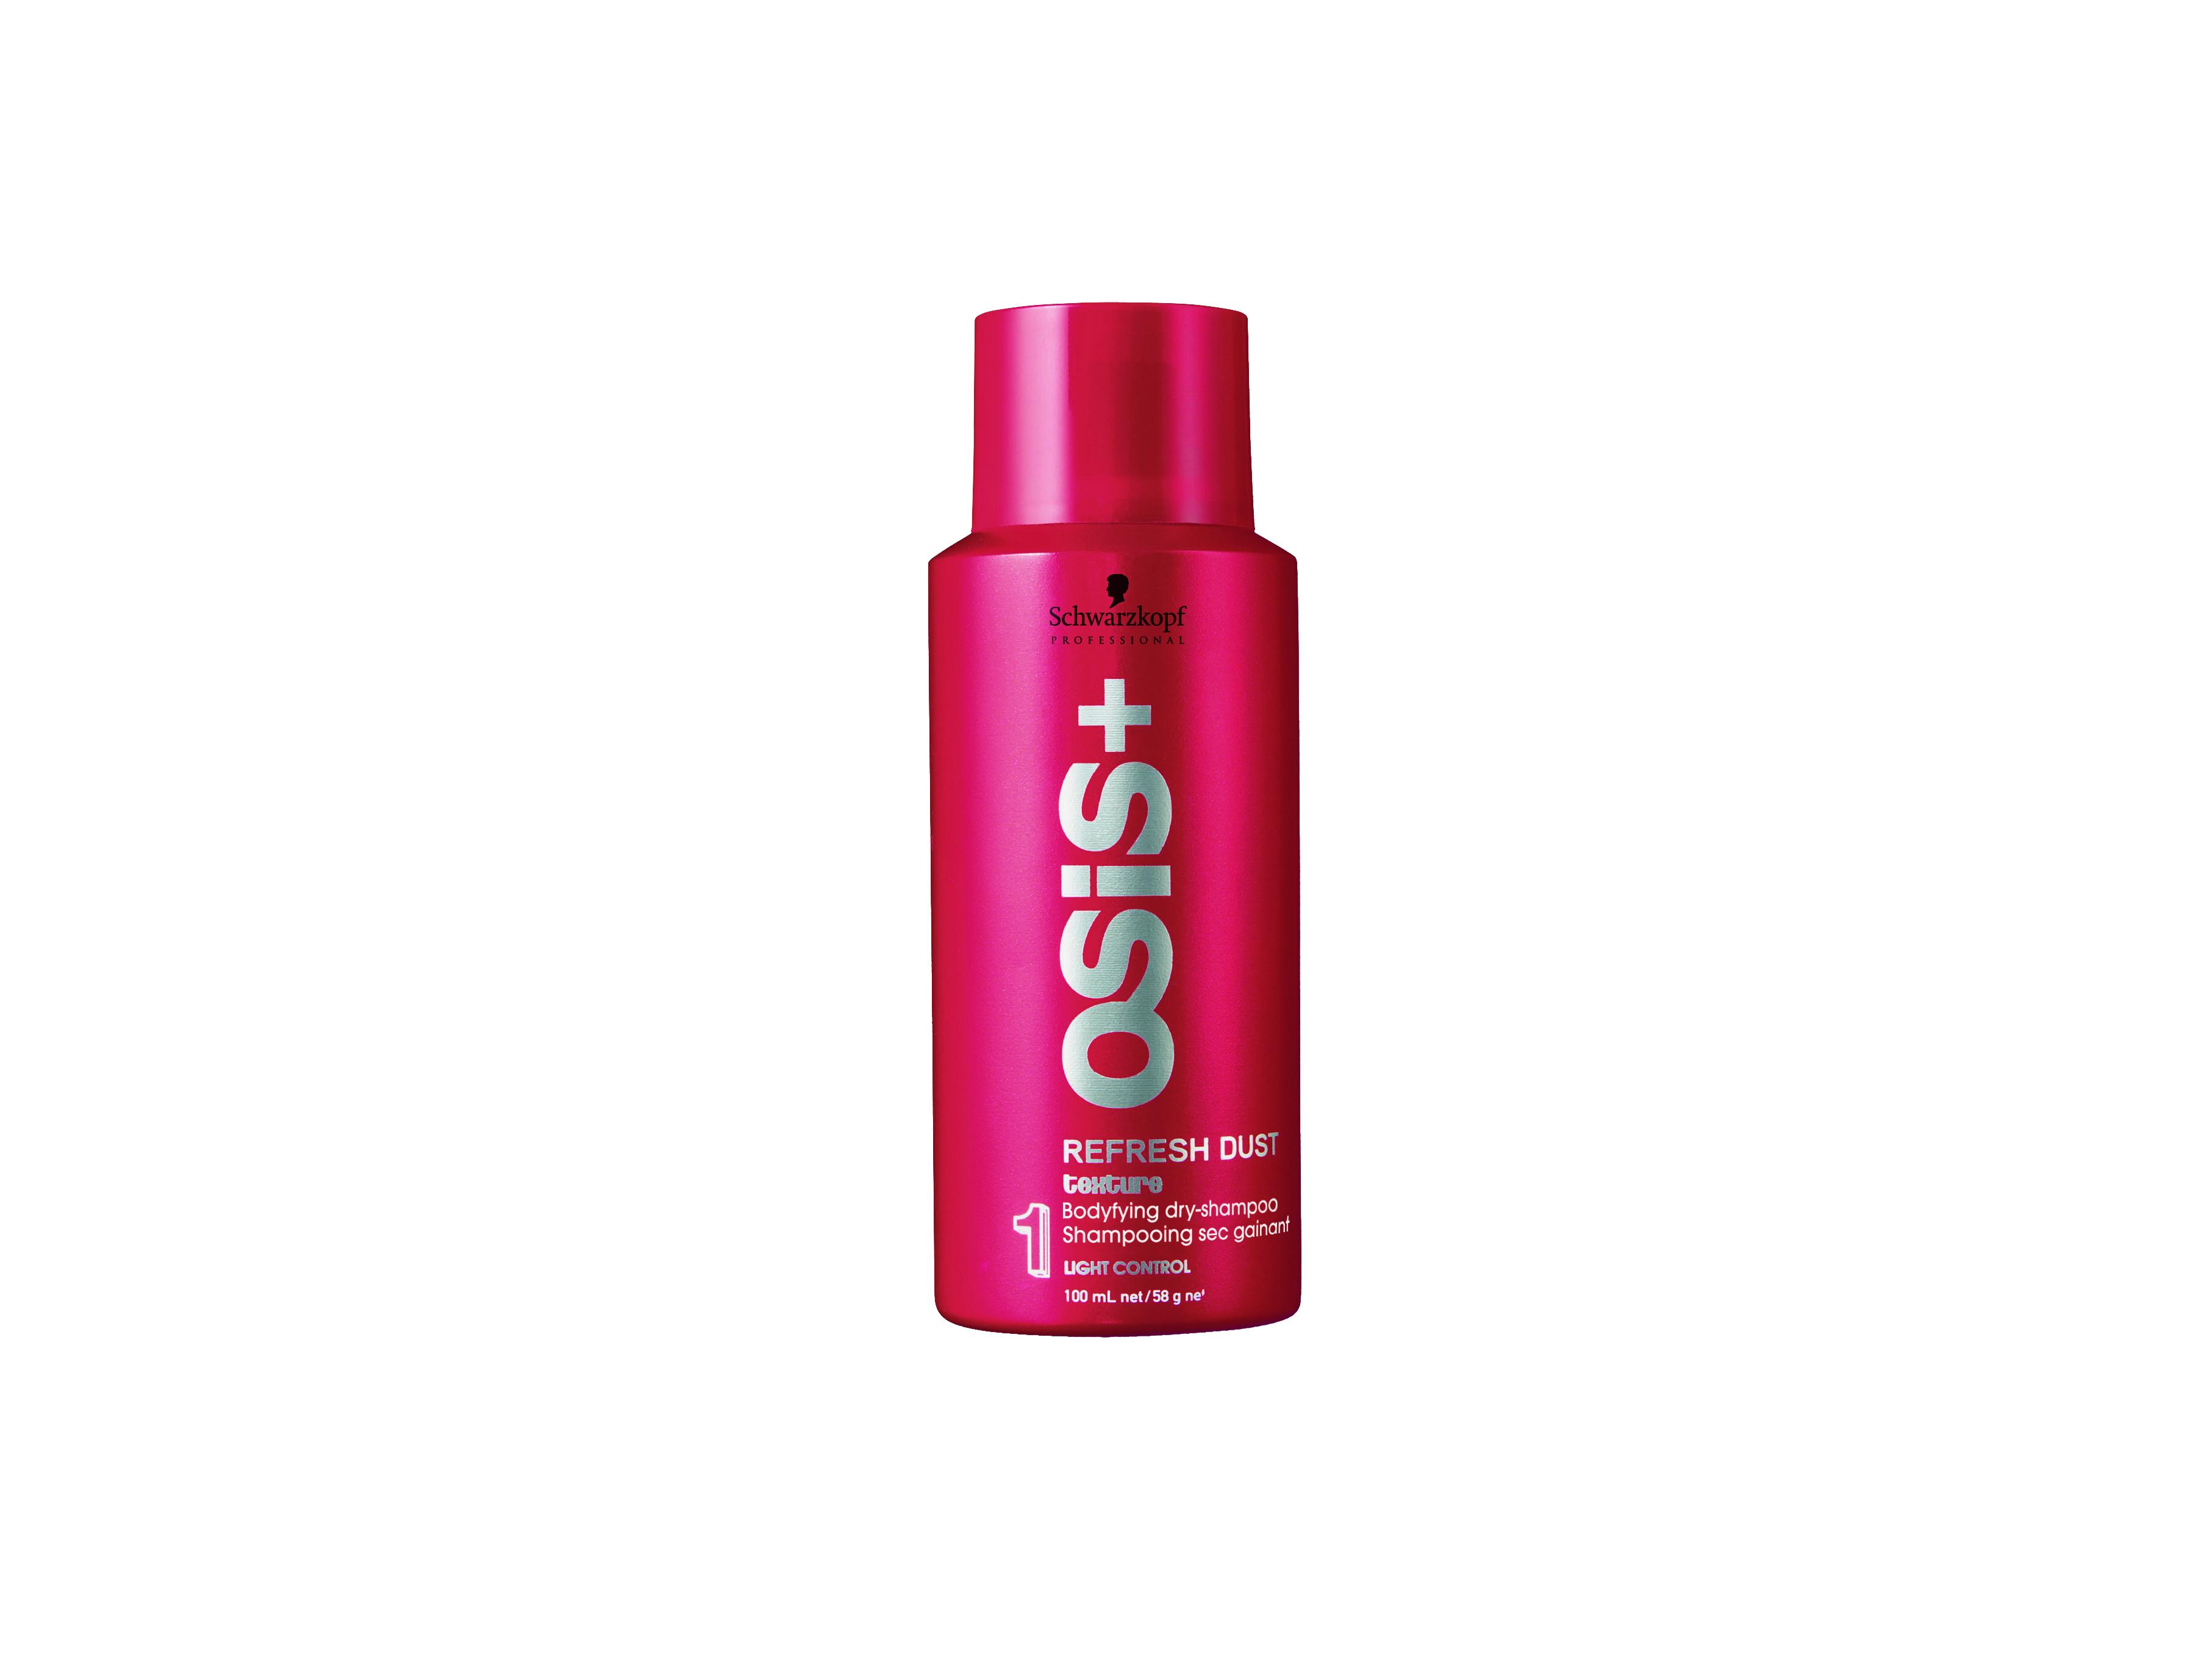 schwarzkopf osis refresh dust 300 ml fettiges haar shampoo. Black Bedroom Furniture Sets. Home Design Ideas